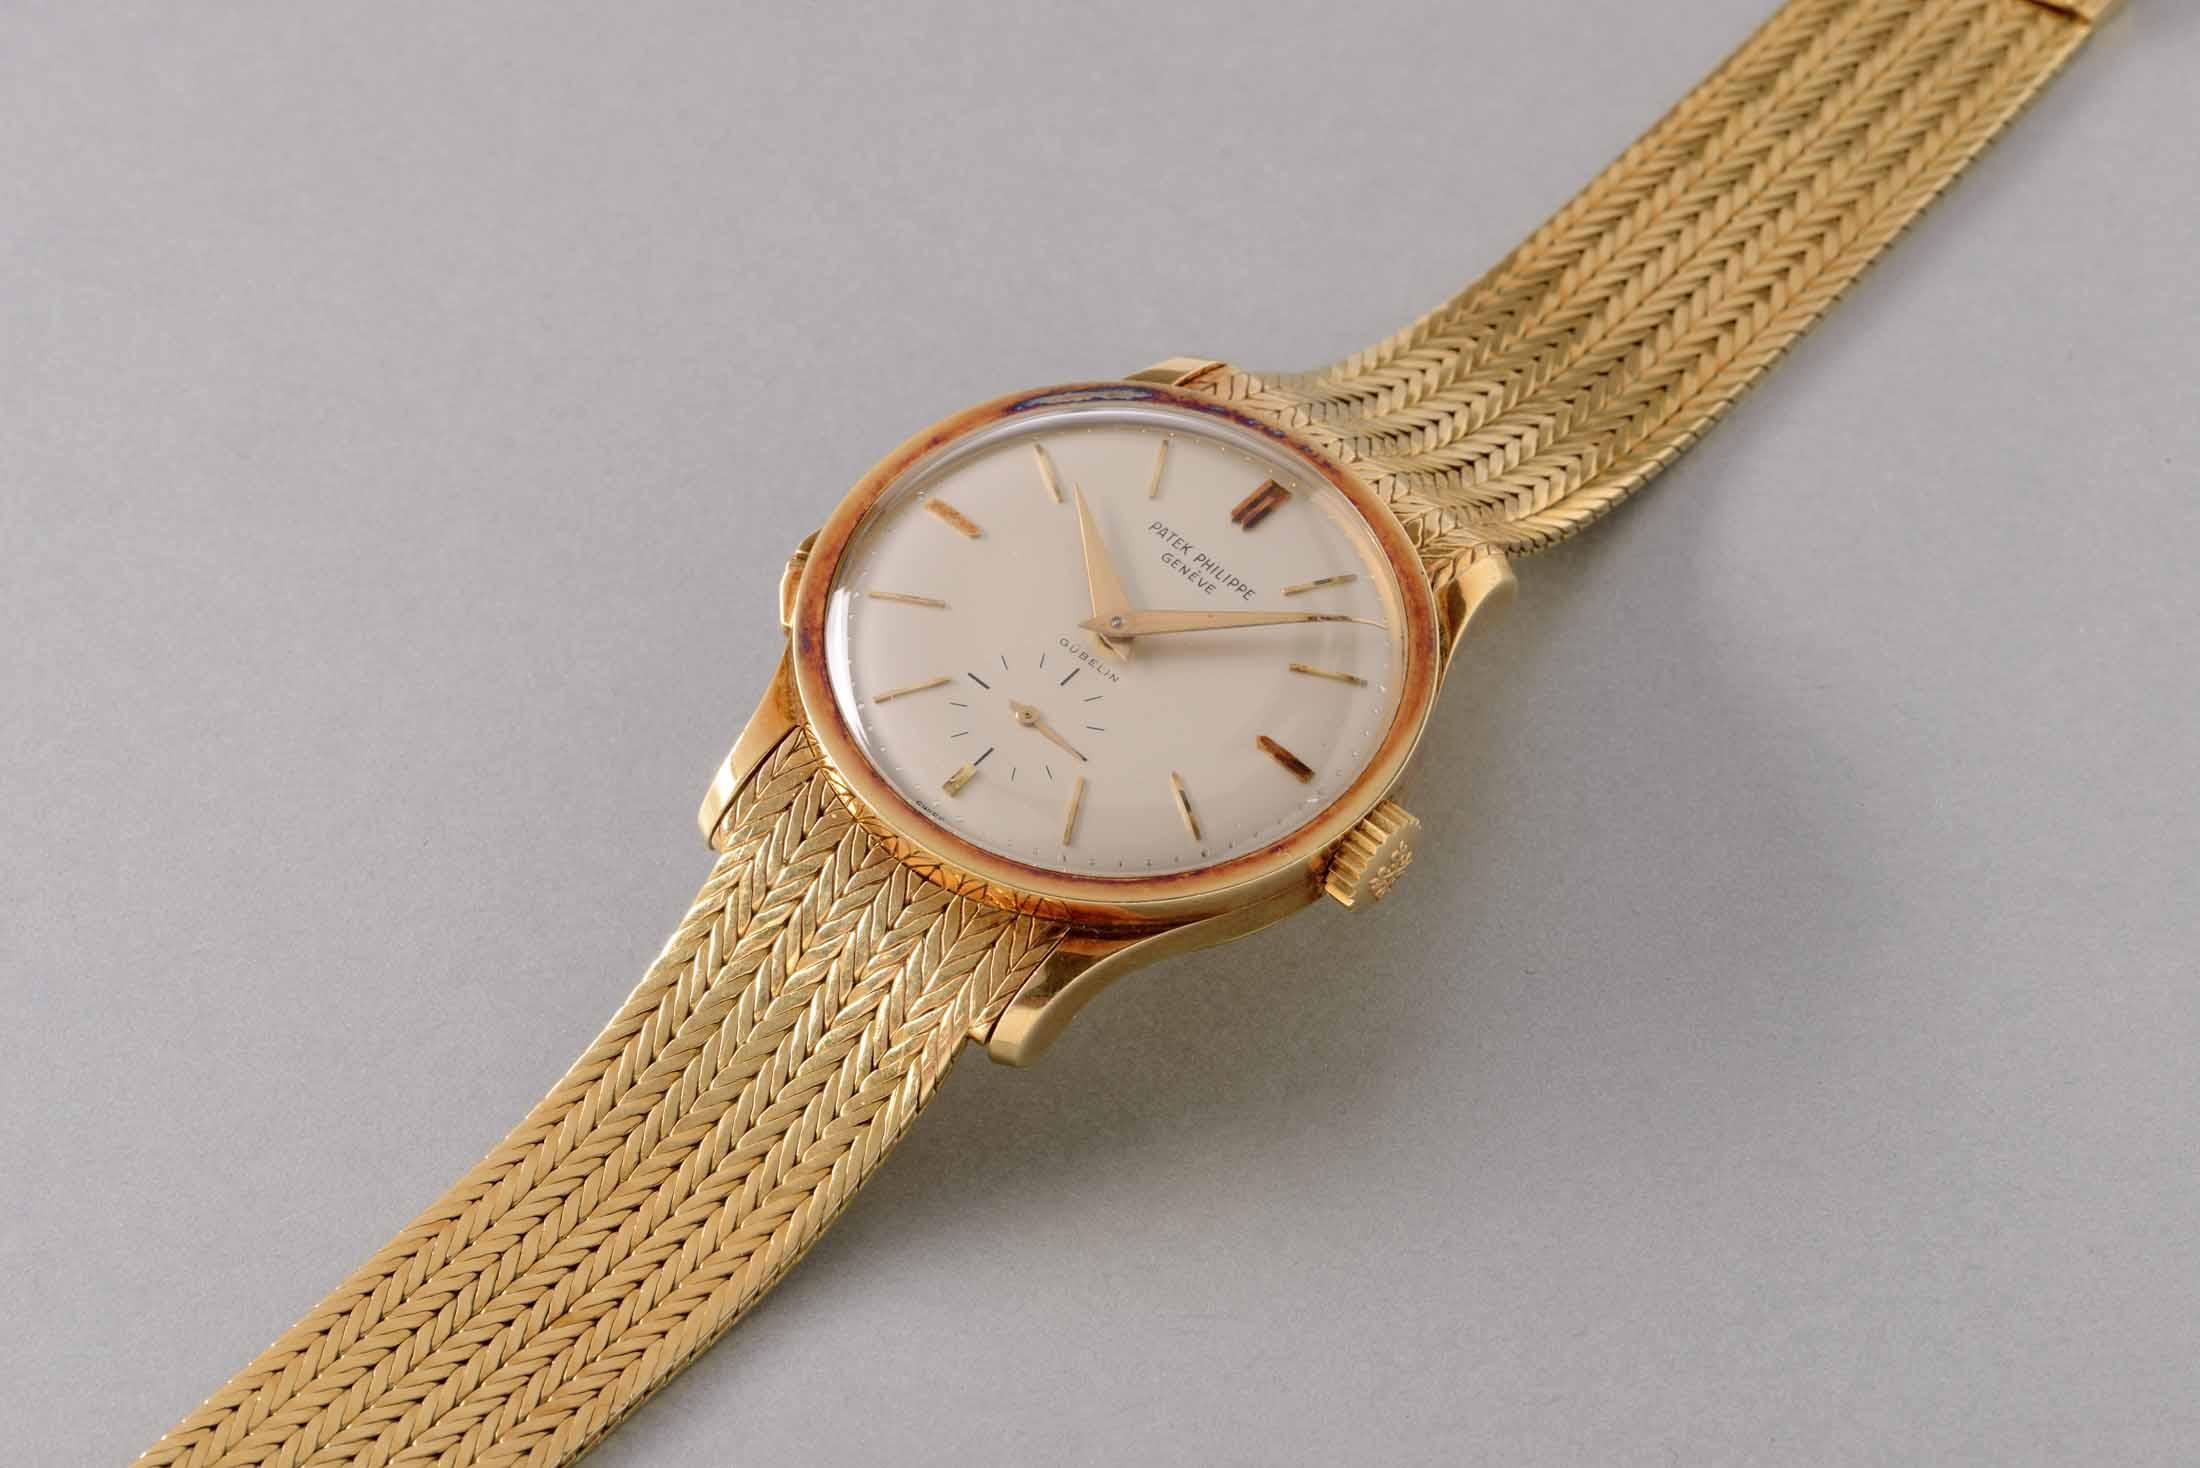 Patek Philippe Yellow-Gold Wristwatch via Gübelin